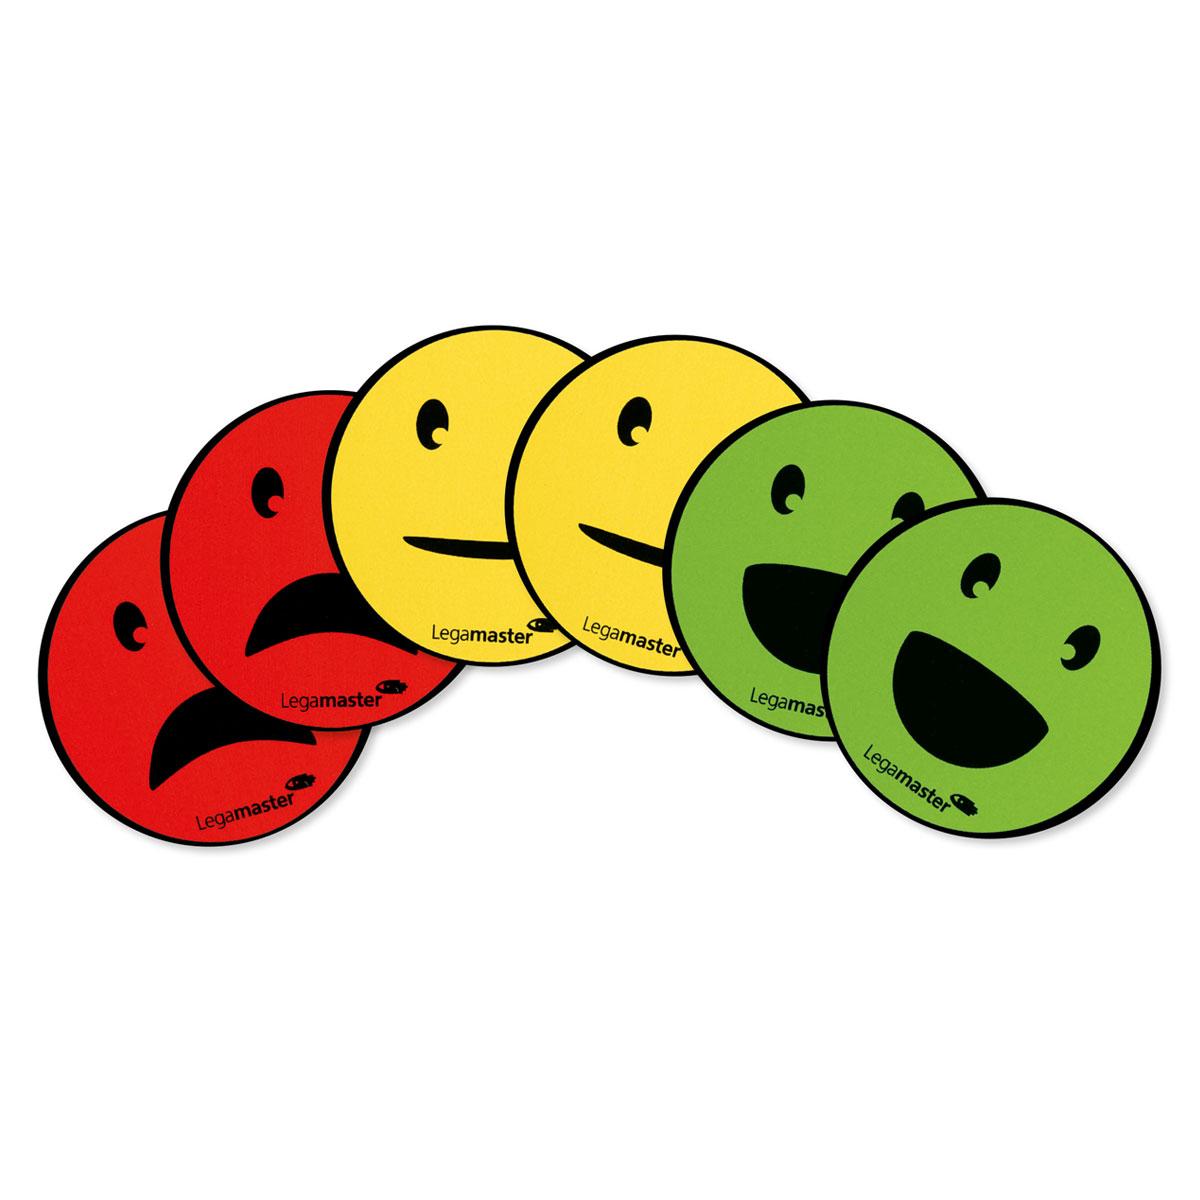 Round magnets - faces: neutral, smile, sad